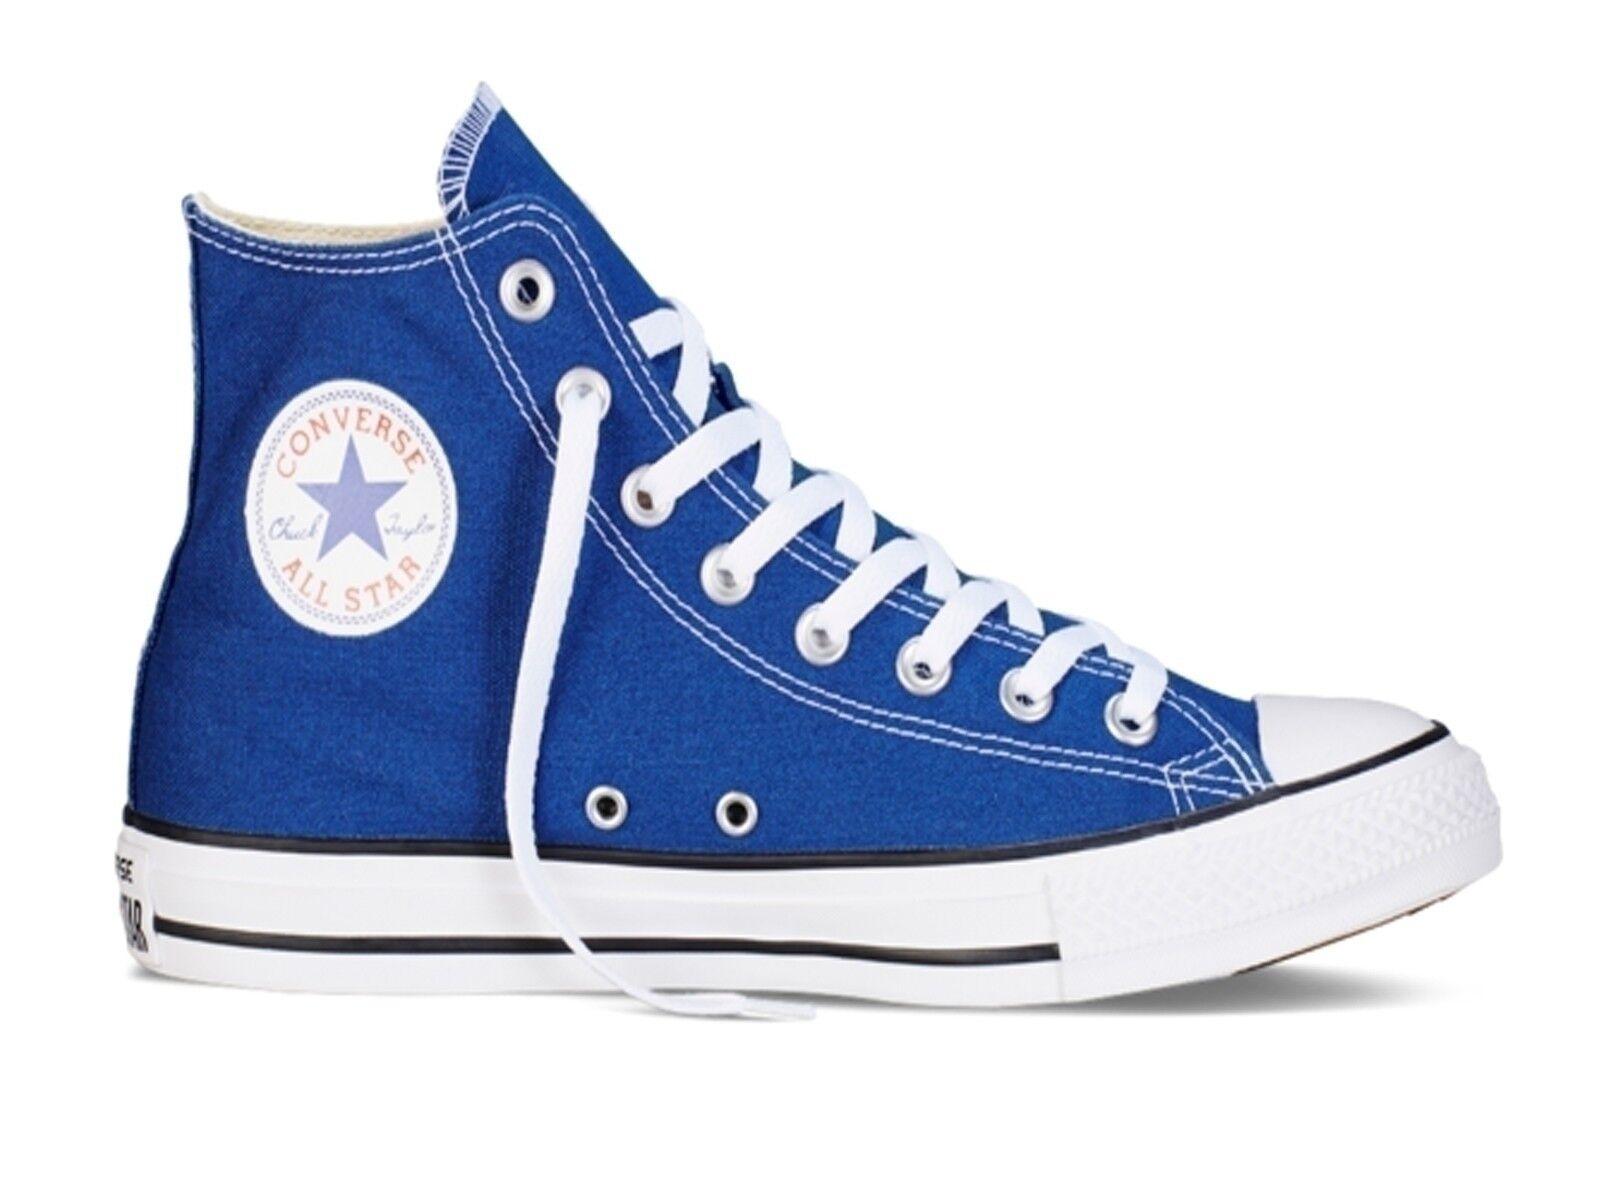 85f7f91108df9 Zapatos UNISEX CONVERSE 151168C SEASONAL SEASONAL SEASONAL HI ROAD Azul  ea238b